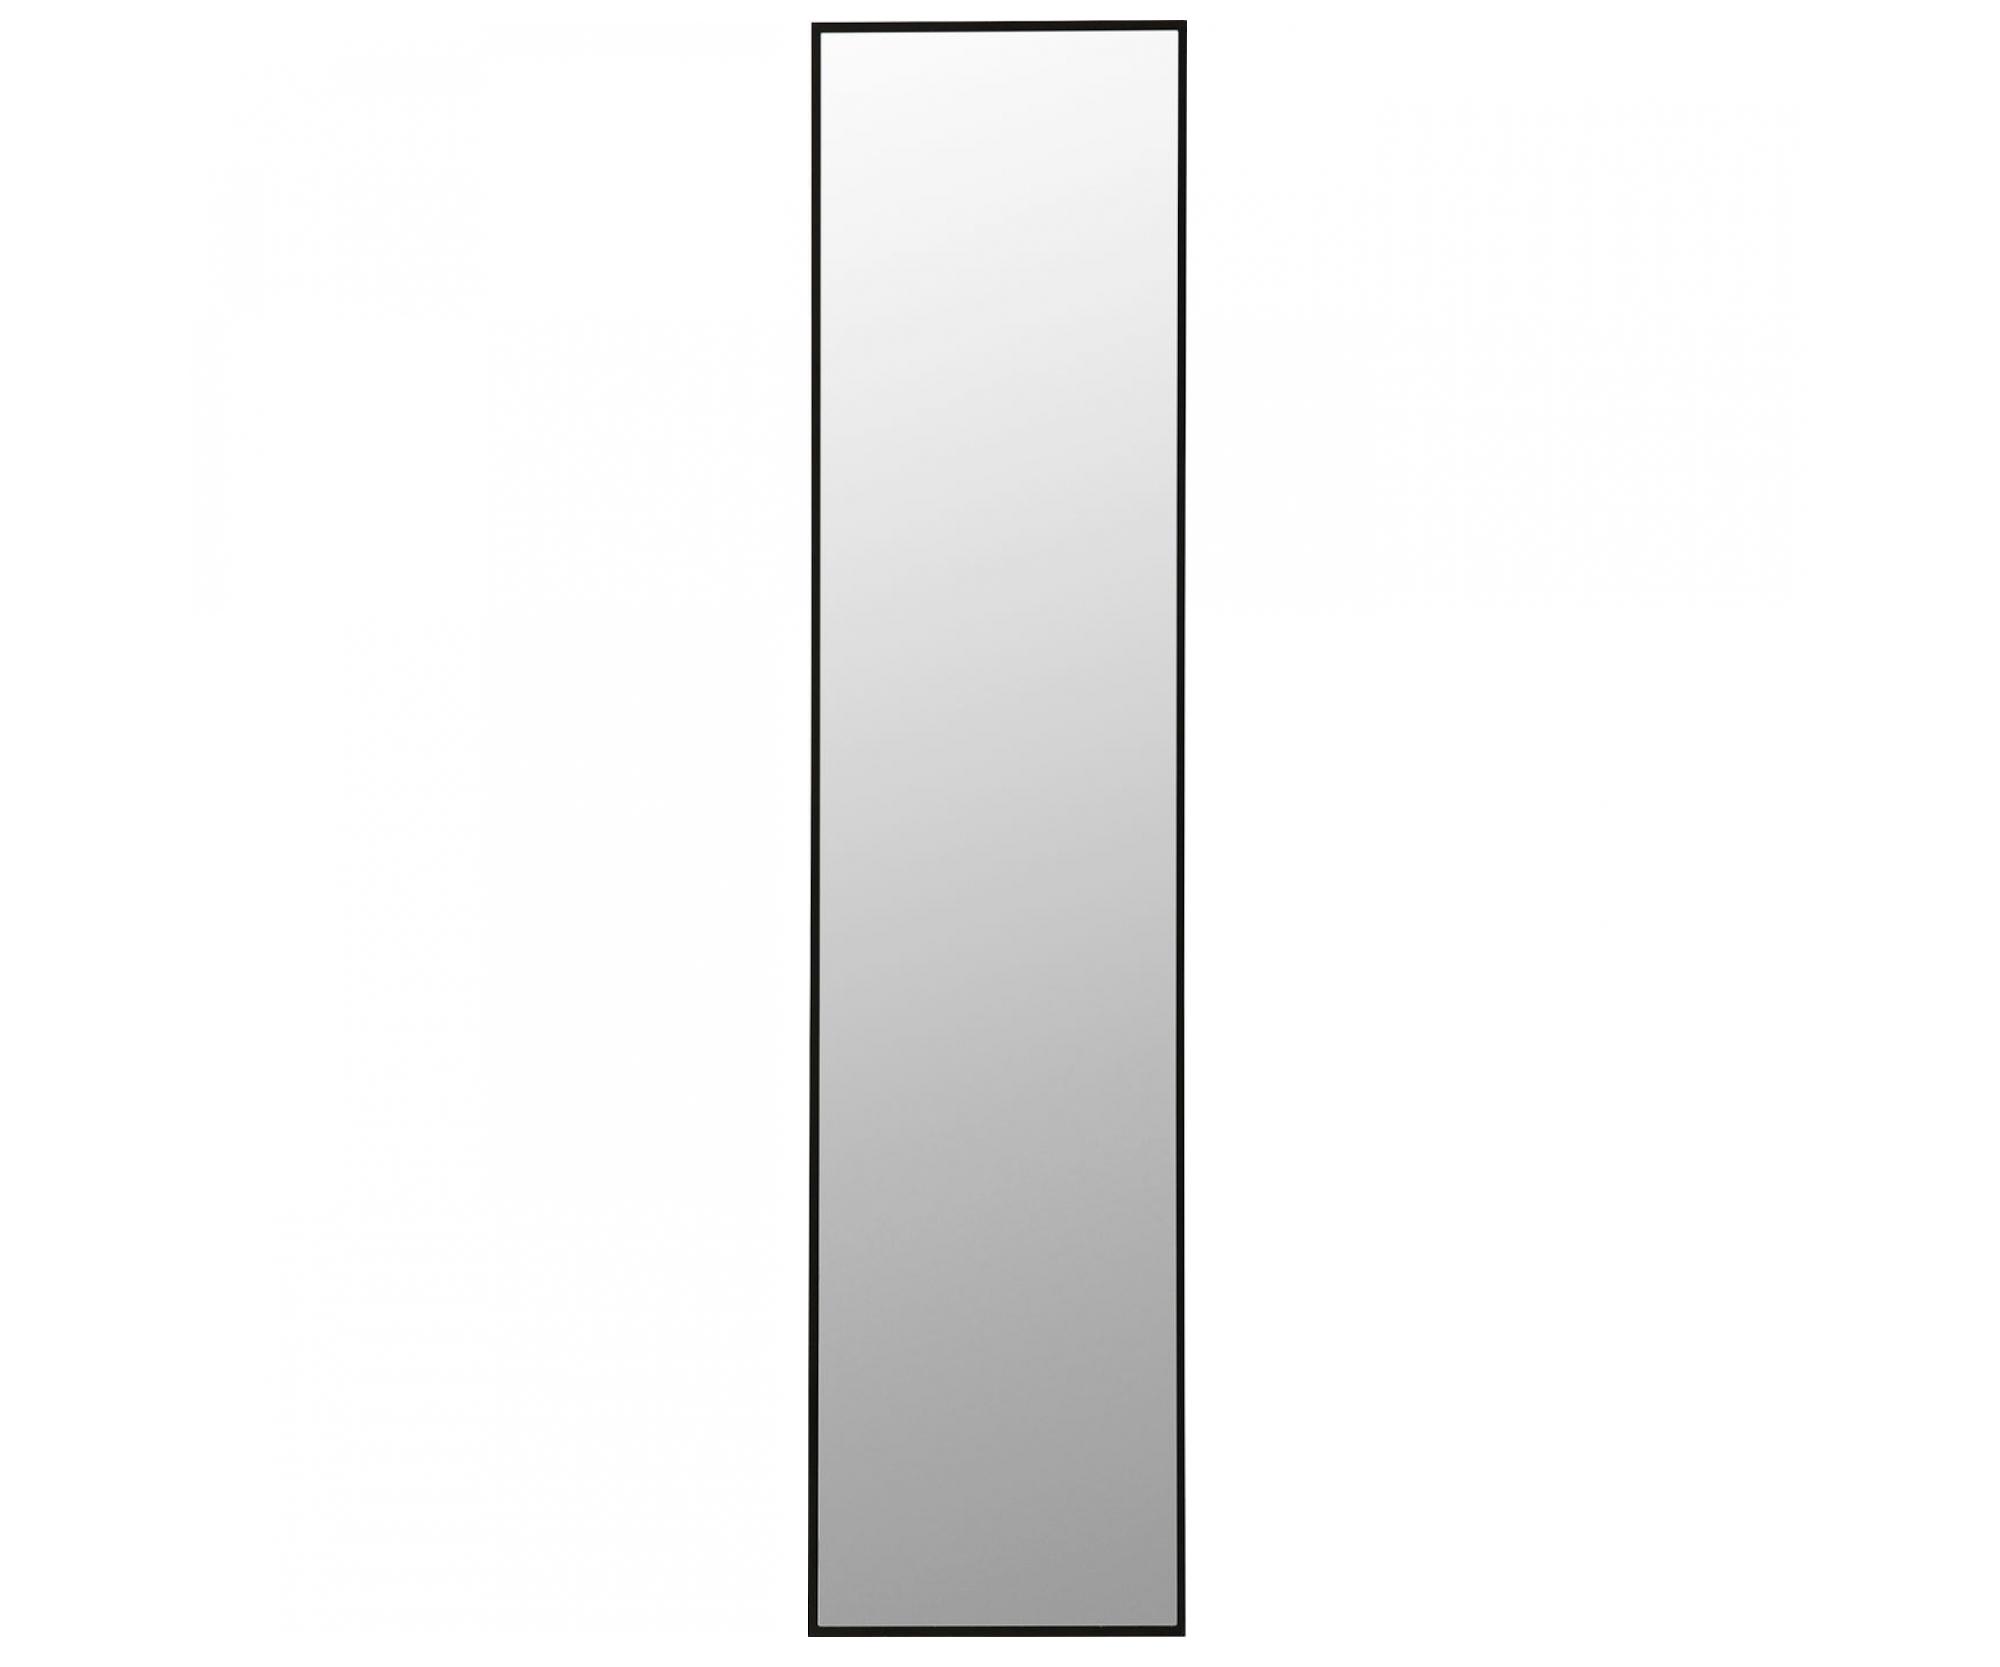 Kadeřnické zrcadlo Kare Bella - černé, 180 x 30 cm (83451) + DÁREK ZDARMA